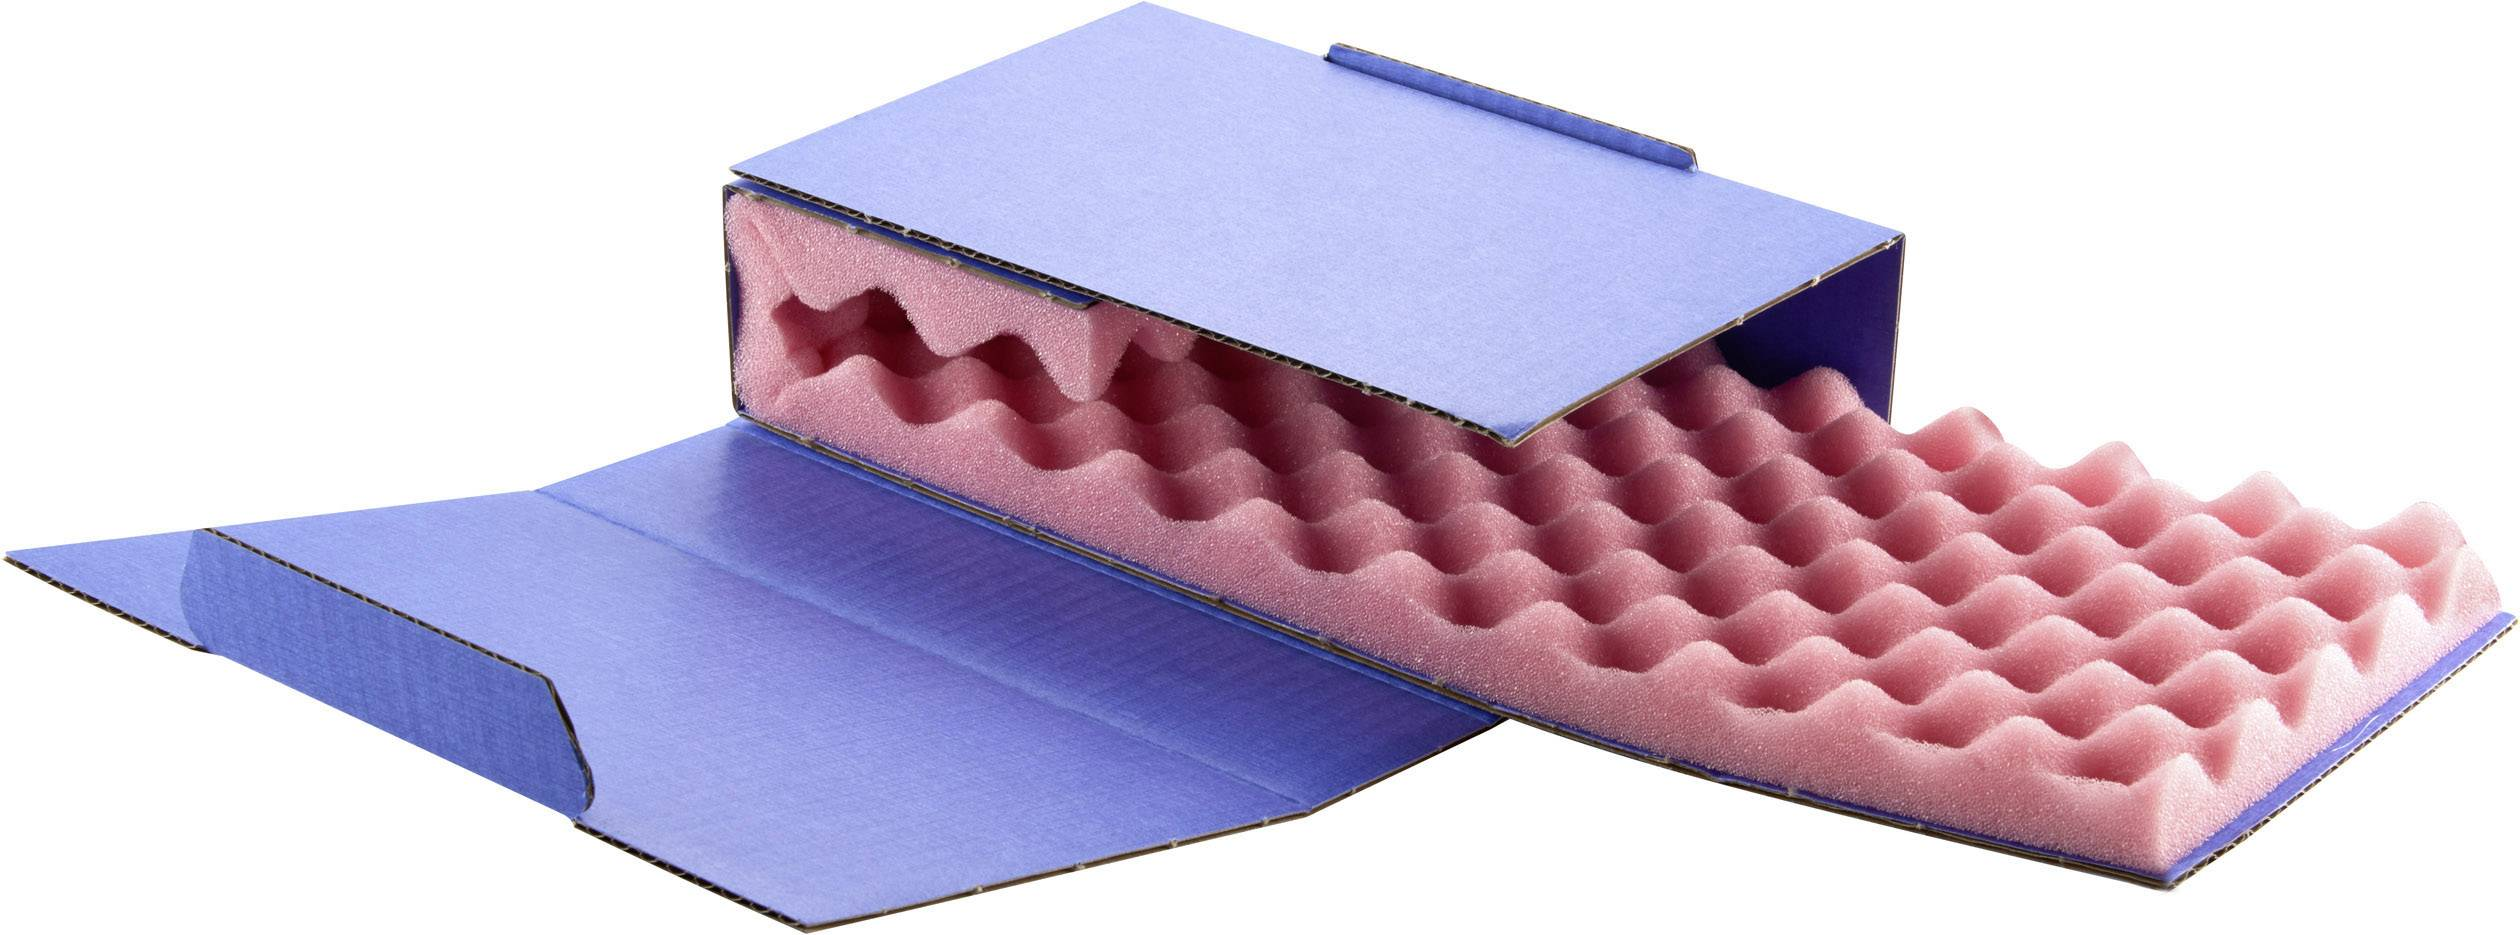 ESD krabice Wolfgang Warmbier (d x š x v) 200 x 140 x 50 mm, vodivá